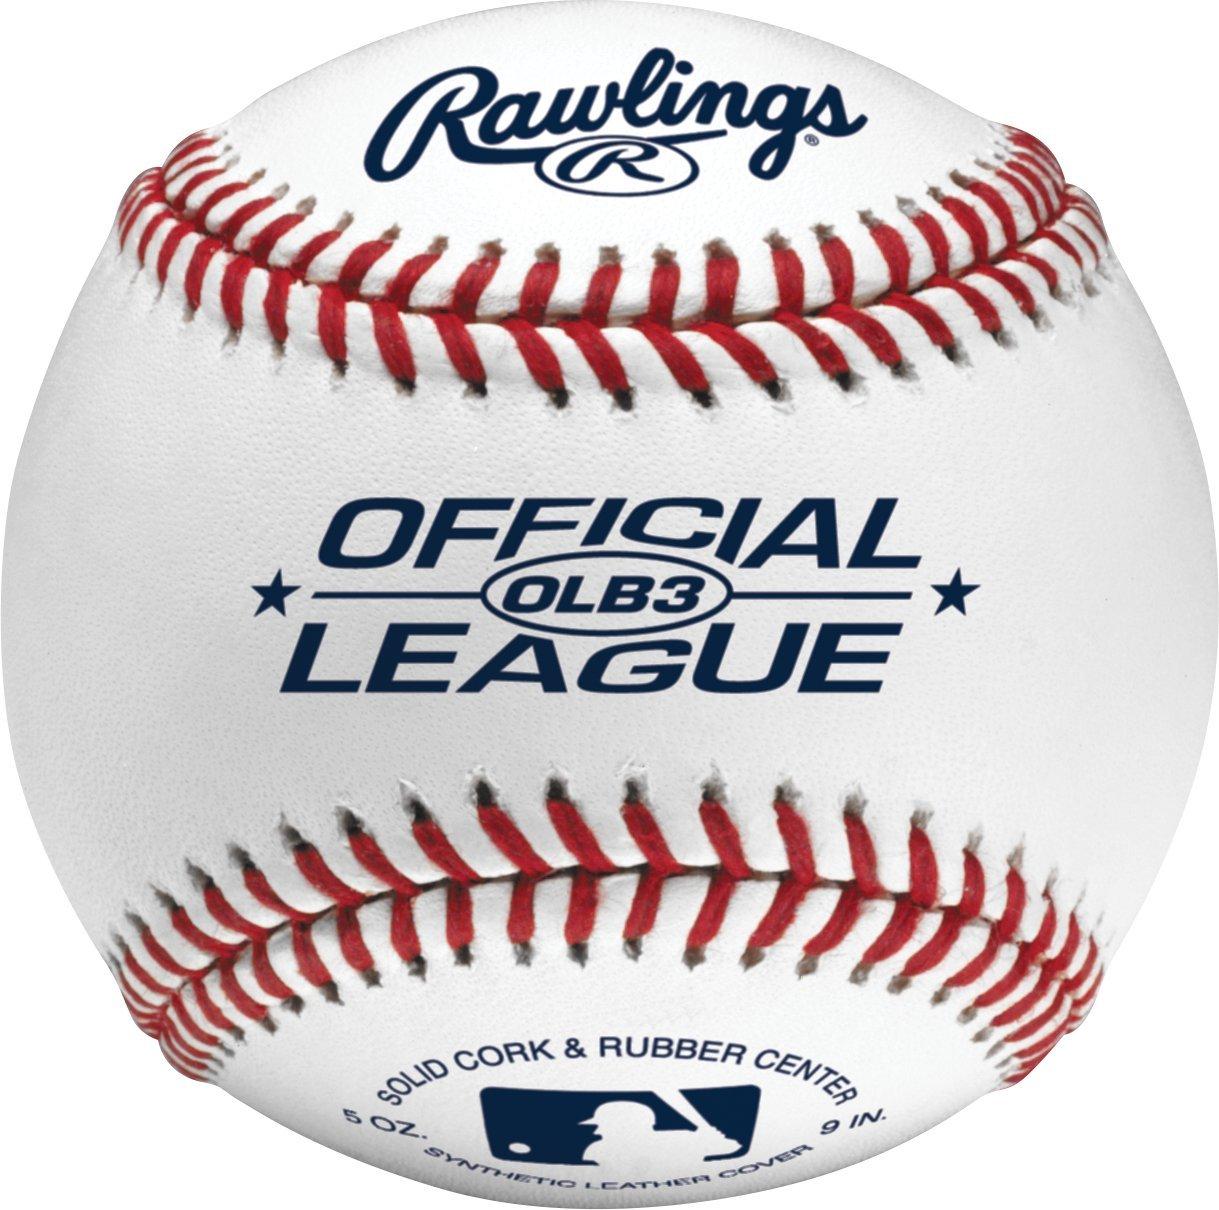 Useful 12 Mlb Baseballs One Dozen New Rawlings Major League Balls Lot All Autographed Sufficient Supply Sporting Goods Baseballs